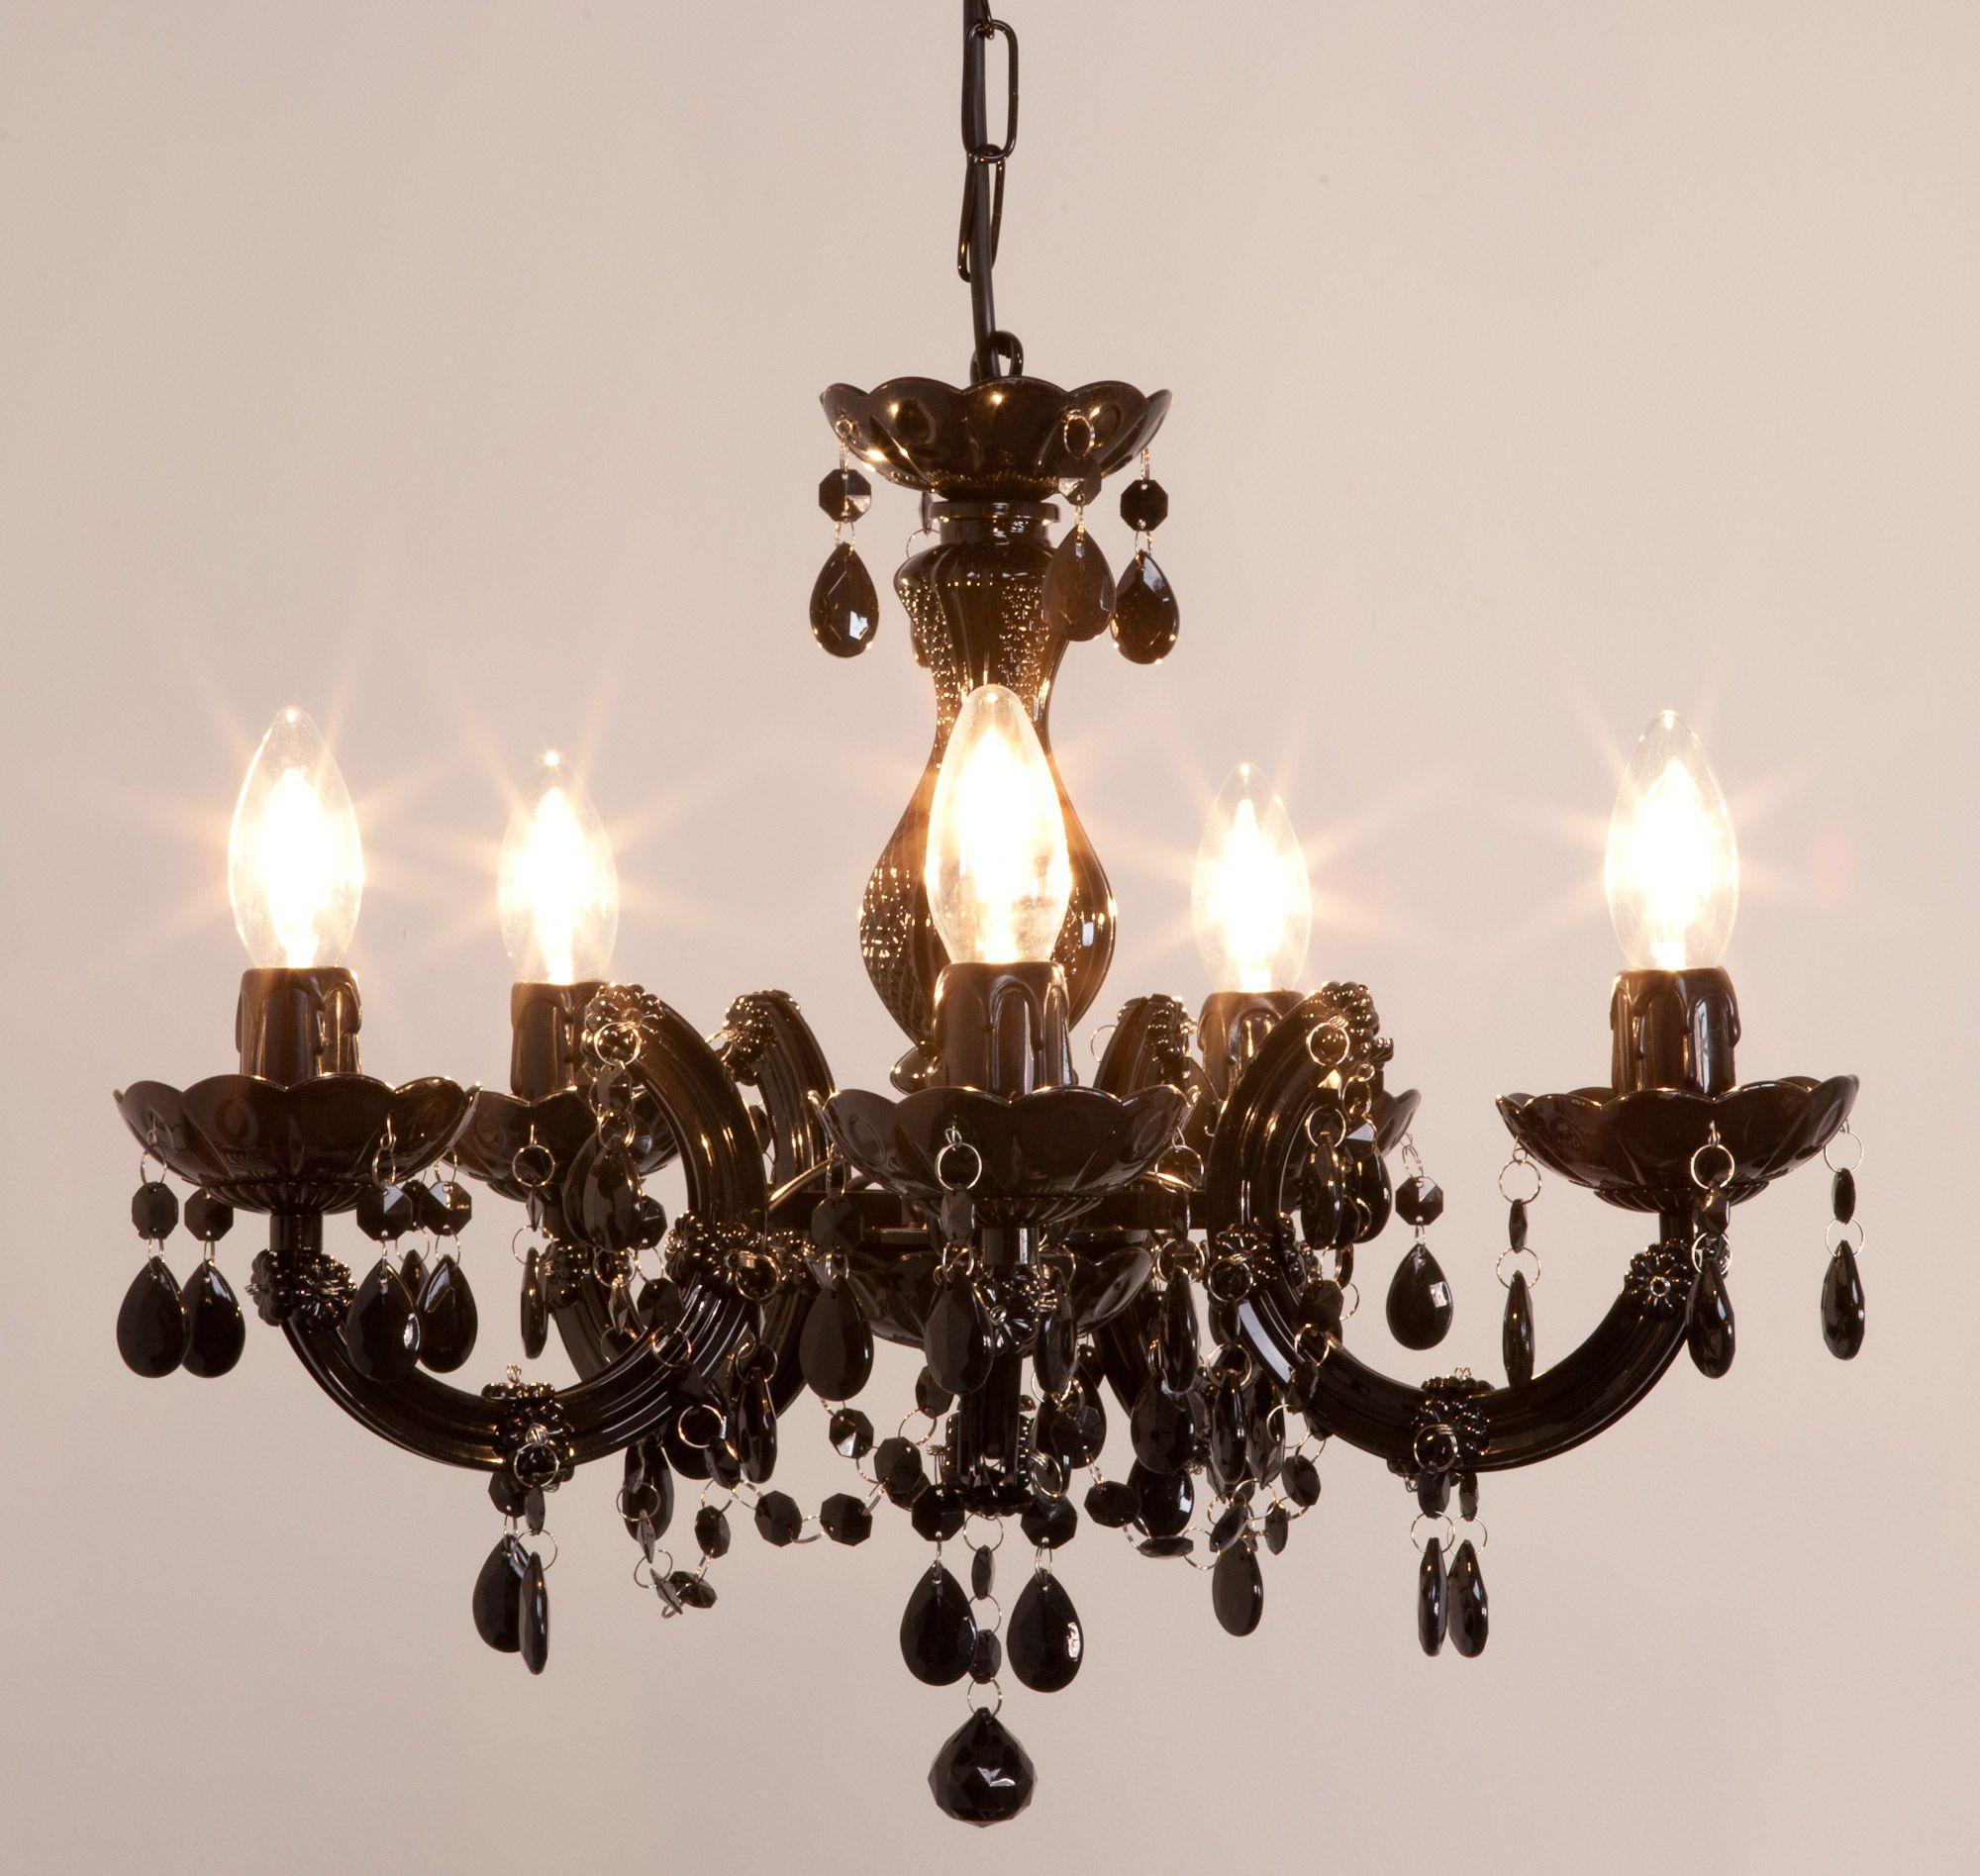 castorama aussi 70 lustre baroque avec pampilles 5. Black Bedroom Furniture Sets. Home Design Ideas